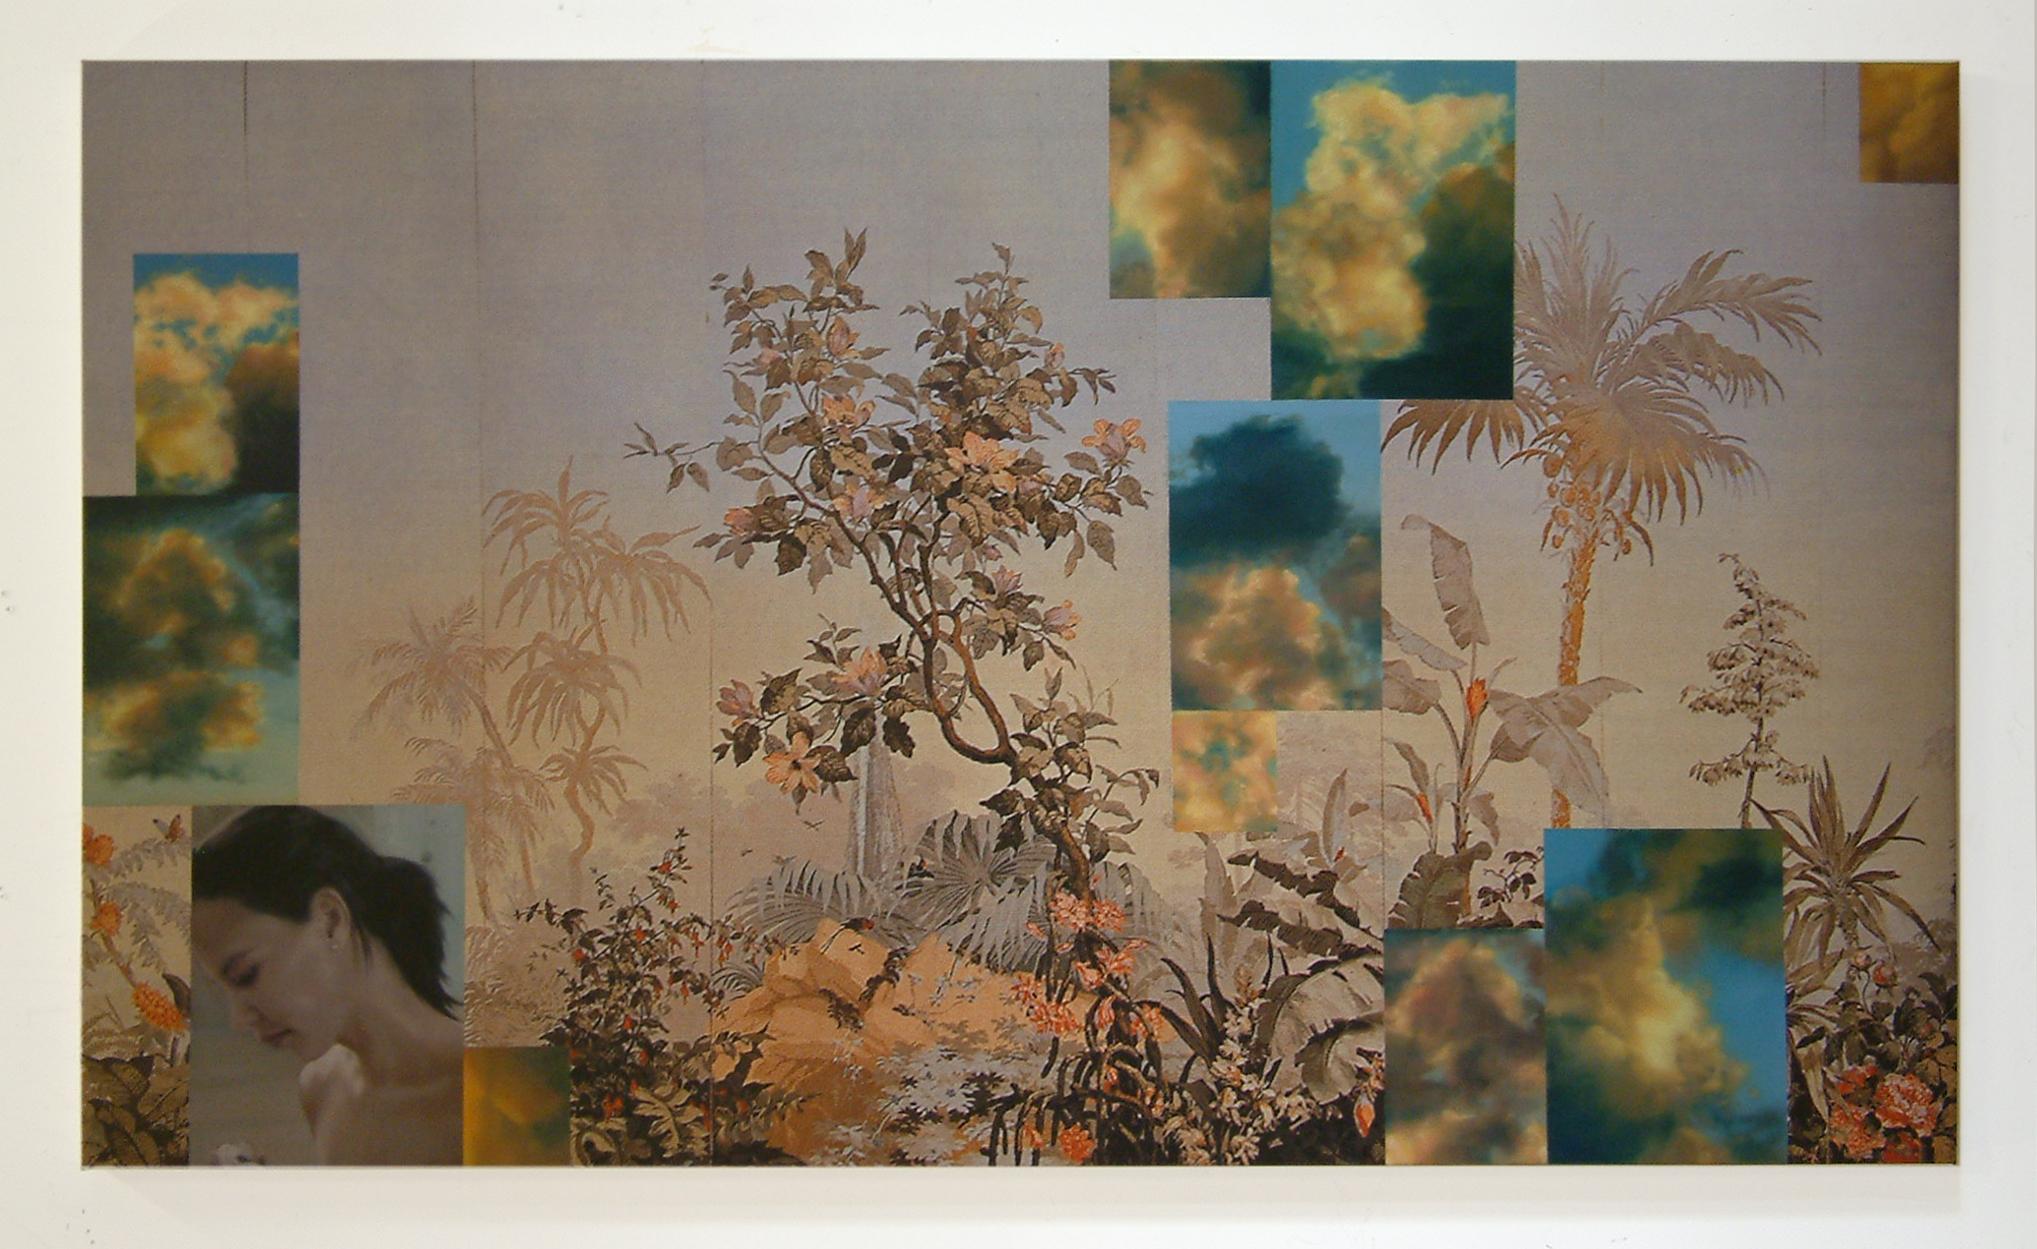 JOHN YOUNG   Eden II  2005 digital print and oil on linen 114 x 196.5 cm